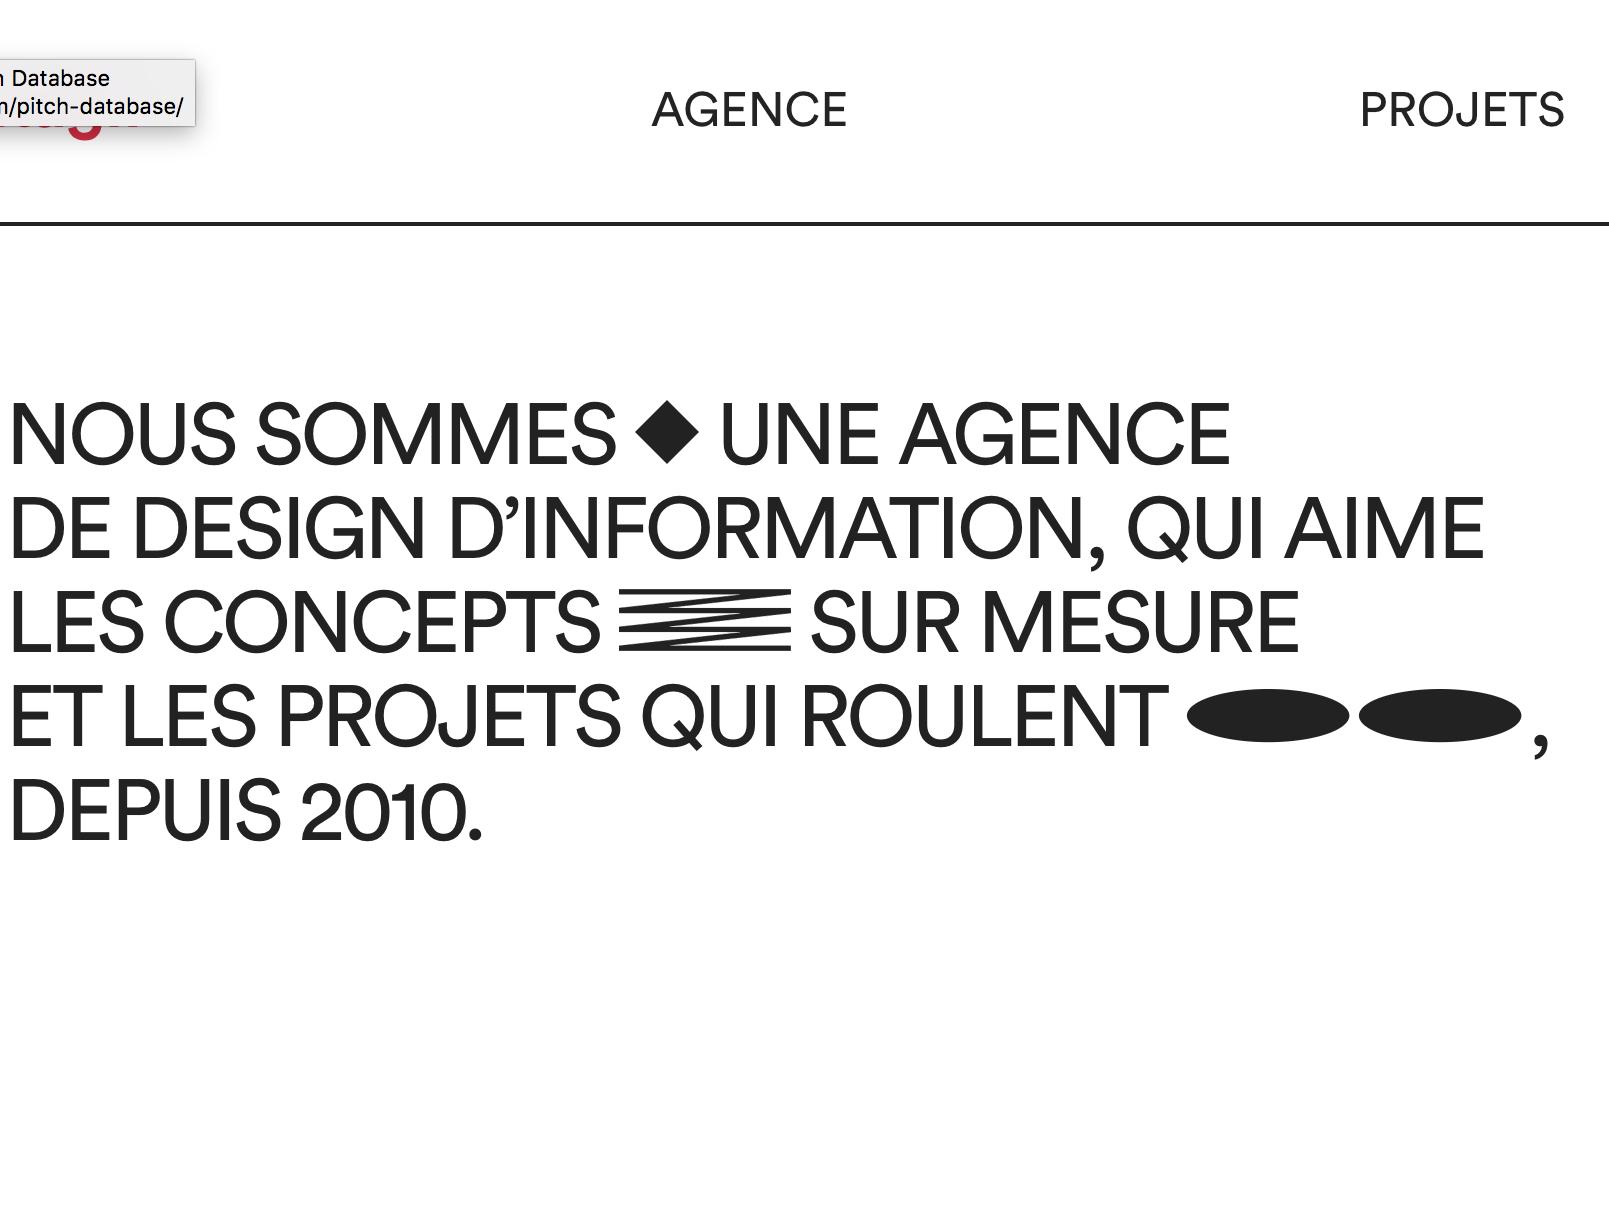 Datagif web design